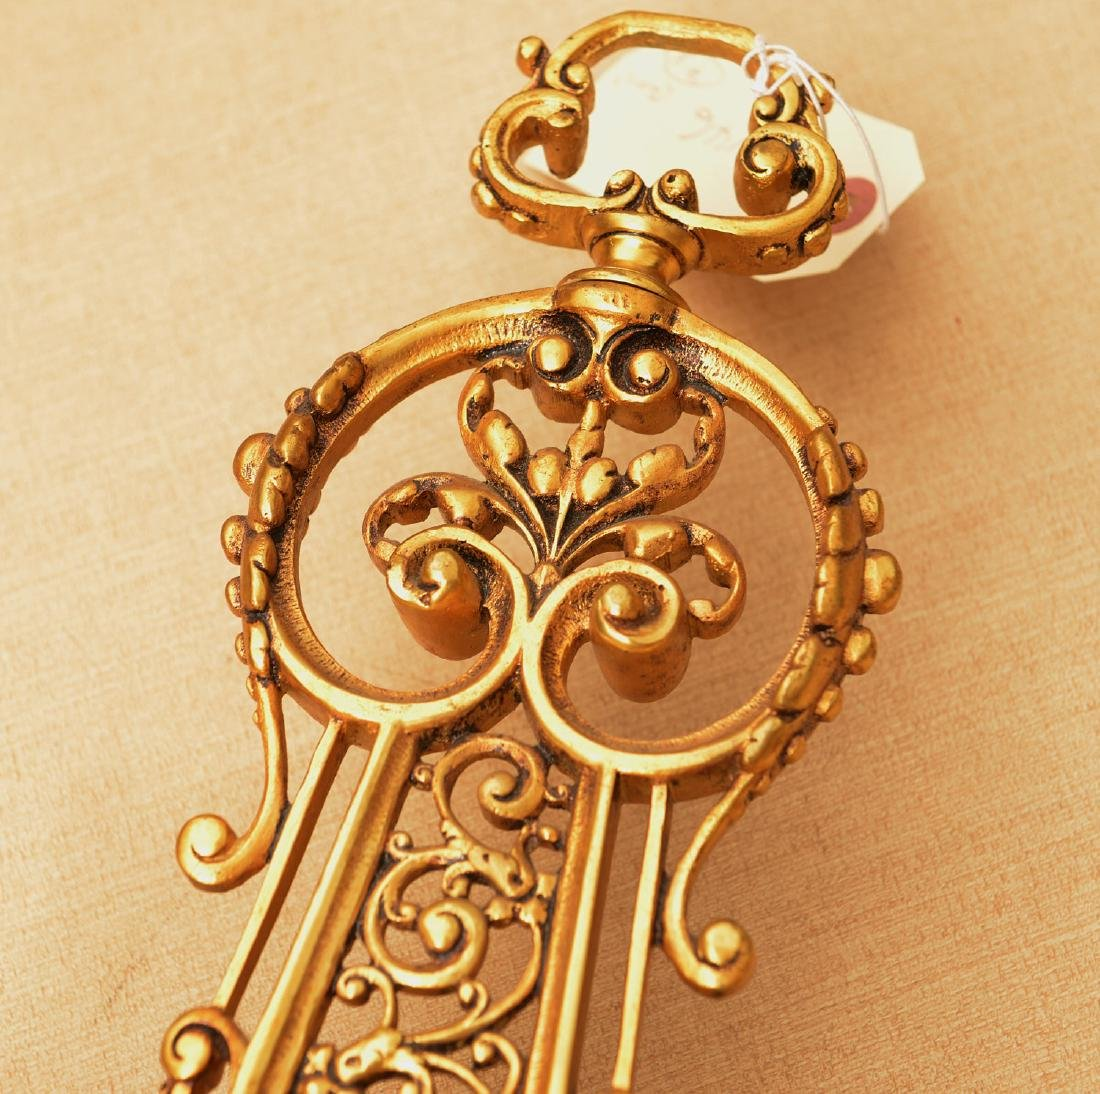 Spanish Renaissance style bronze hanging clock - 3